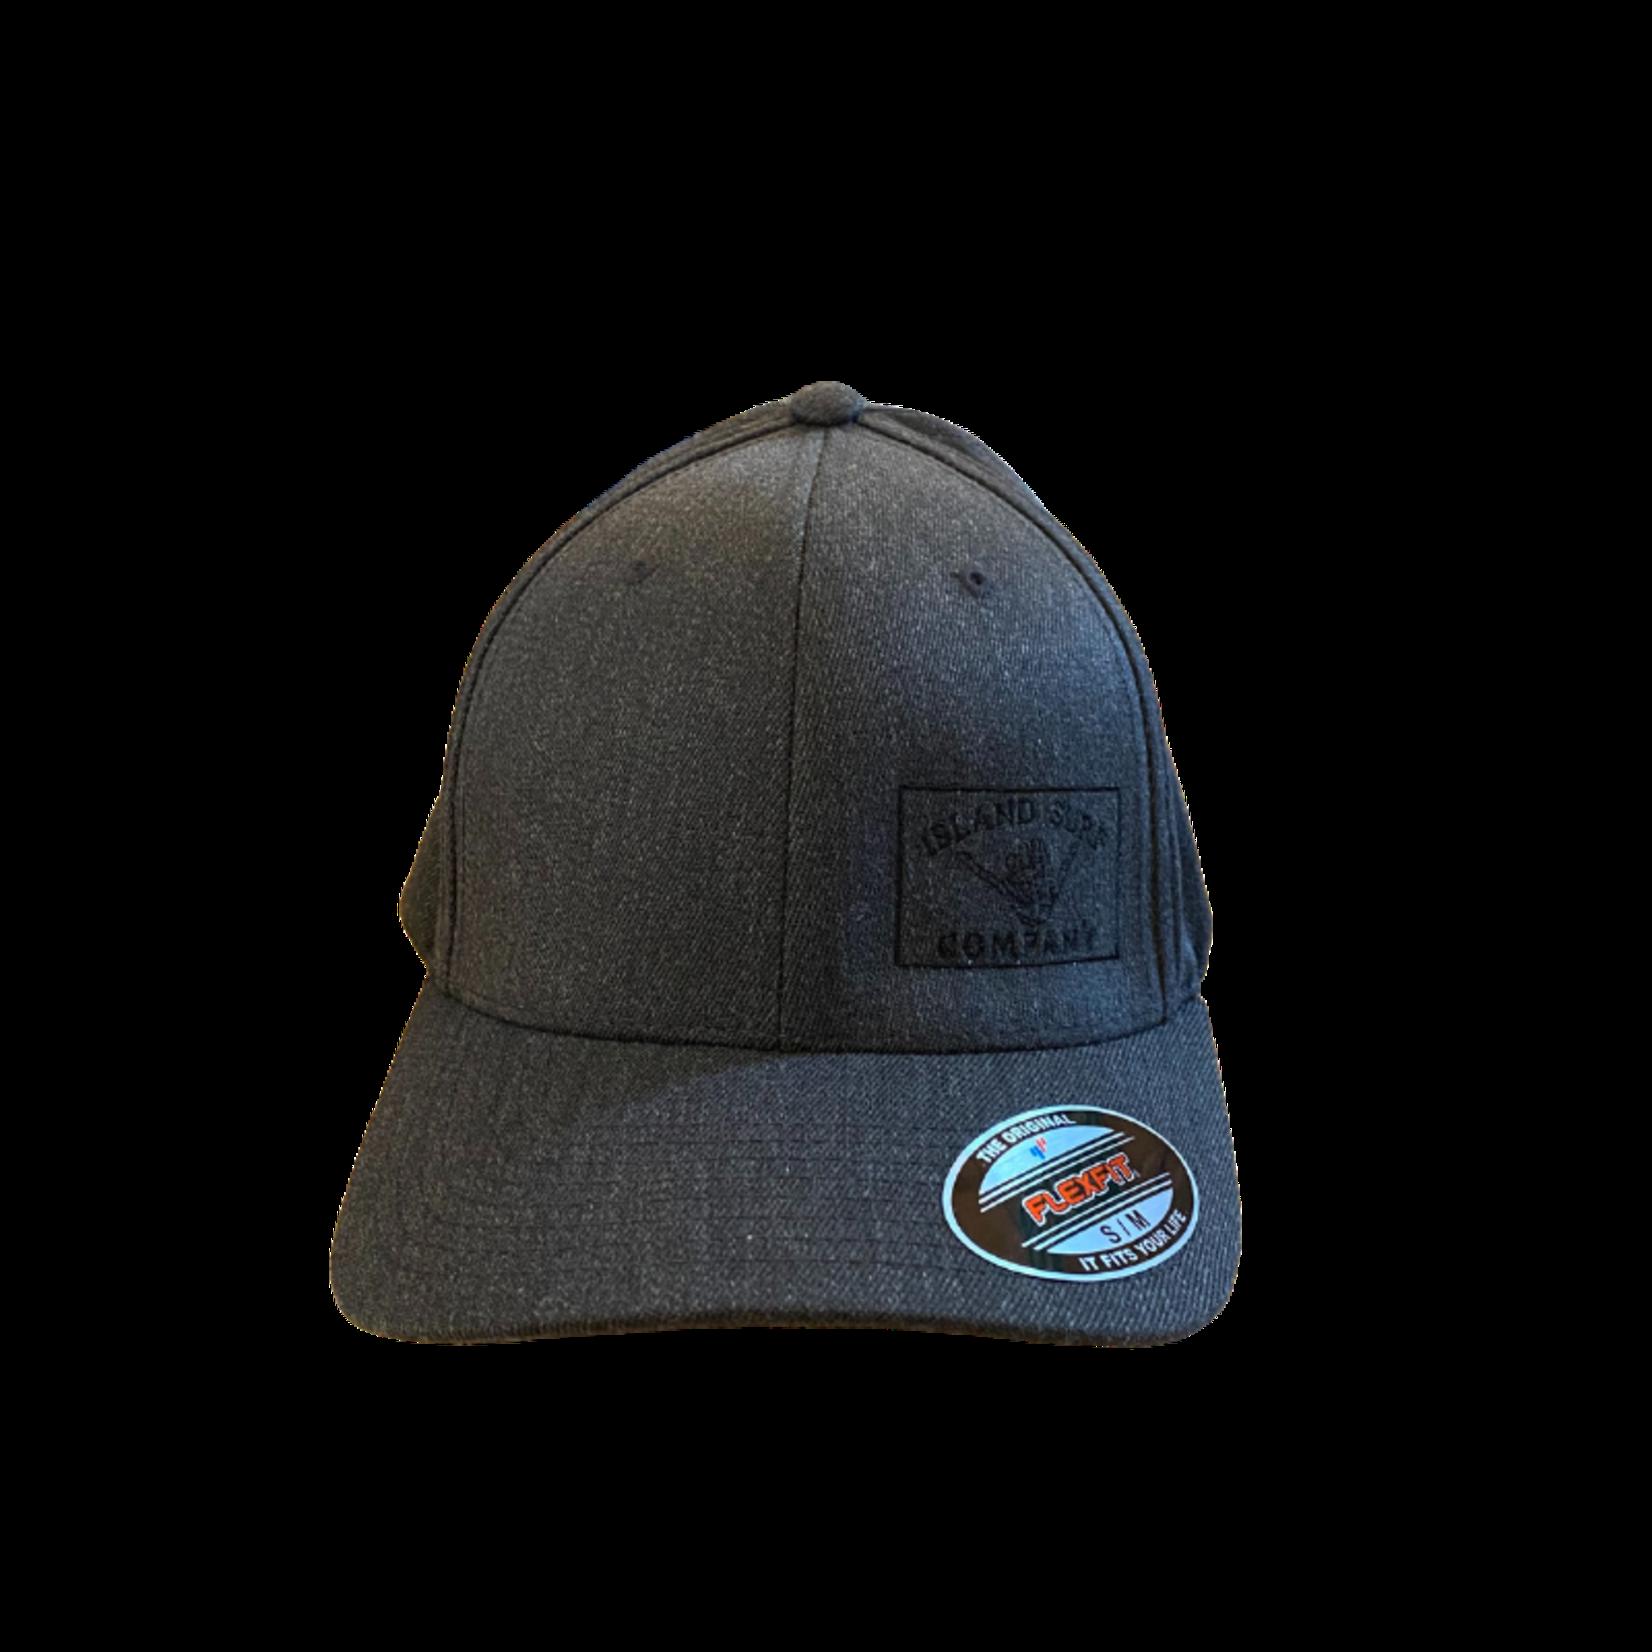 Riptide Island Surf Co. Shaka Hat